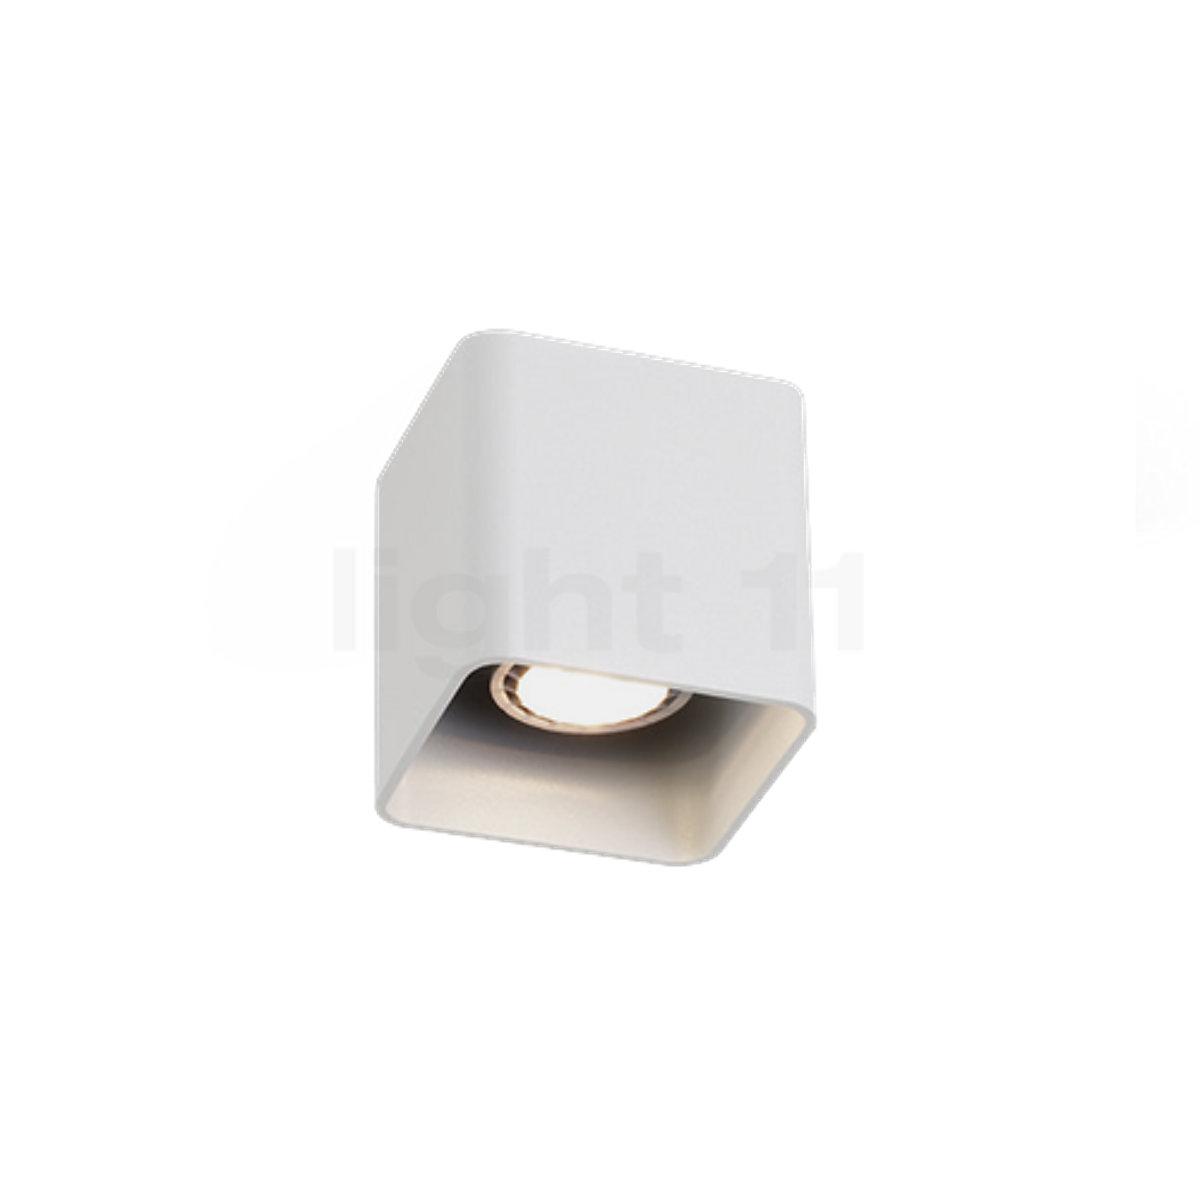 Buy Wever Ducre Docus 1 0 Ceiling Light Led At Light11 Eu